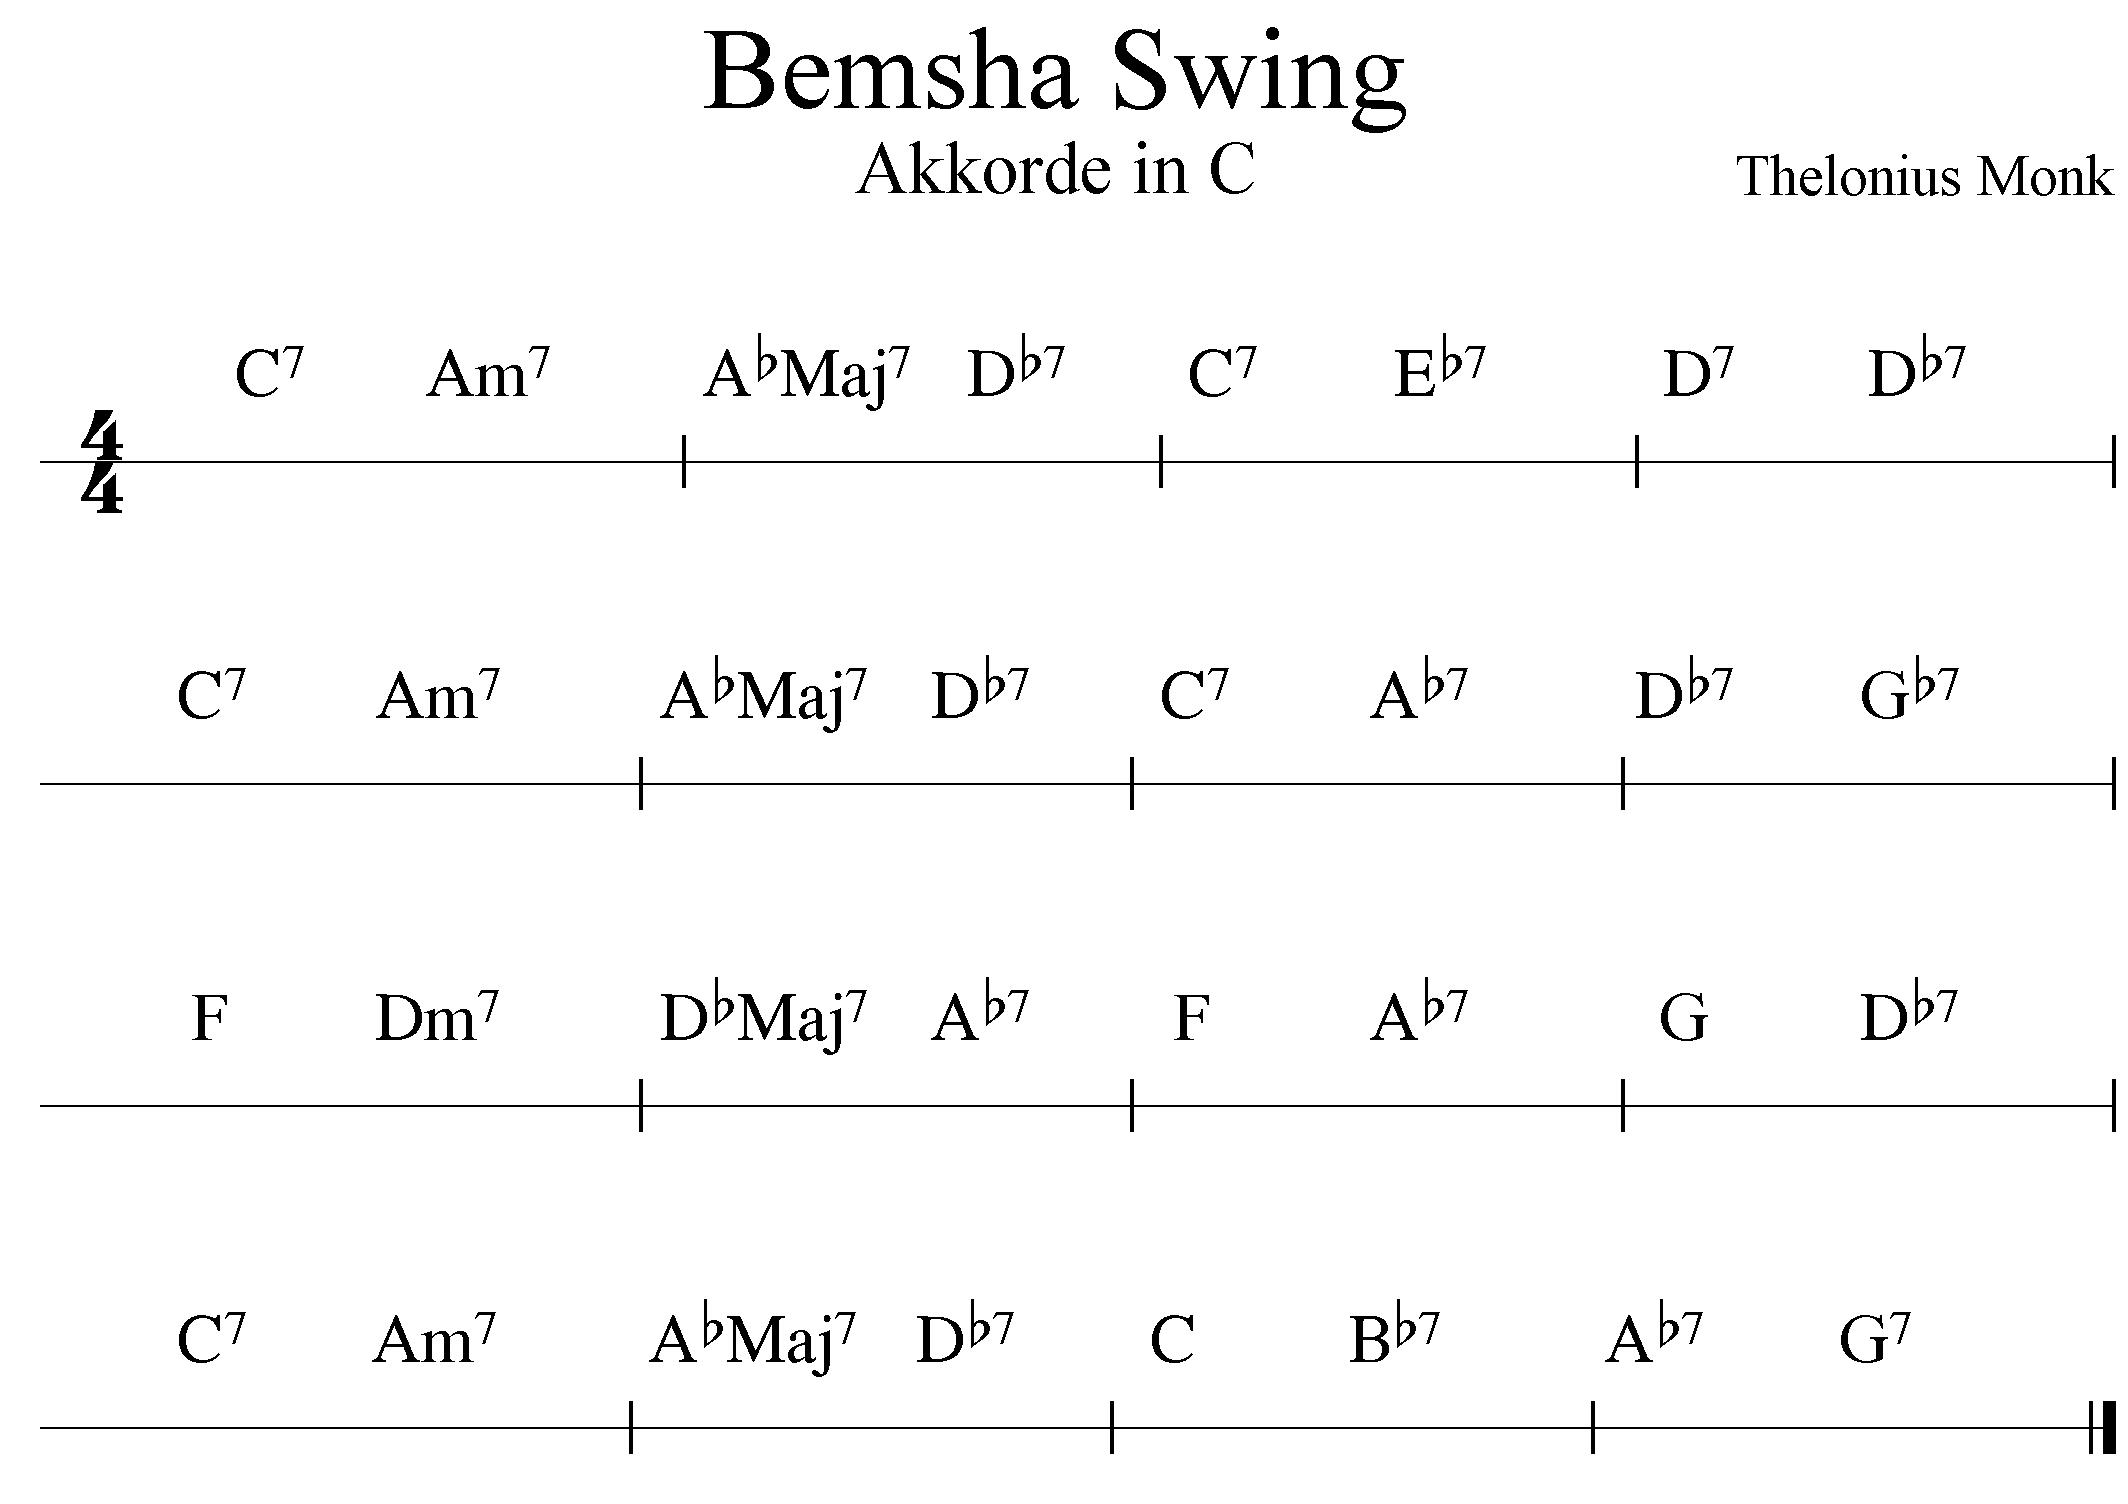 Bemsha Swing - Akkorde in C